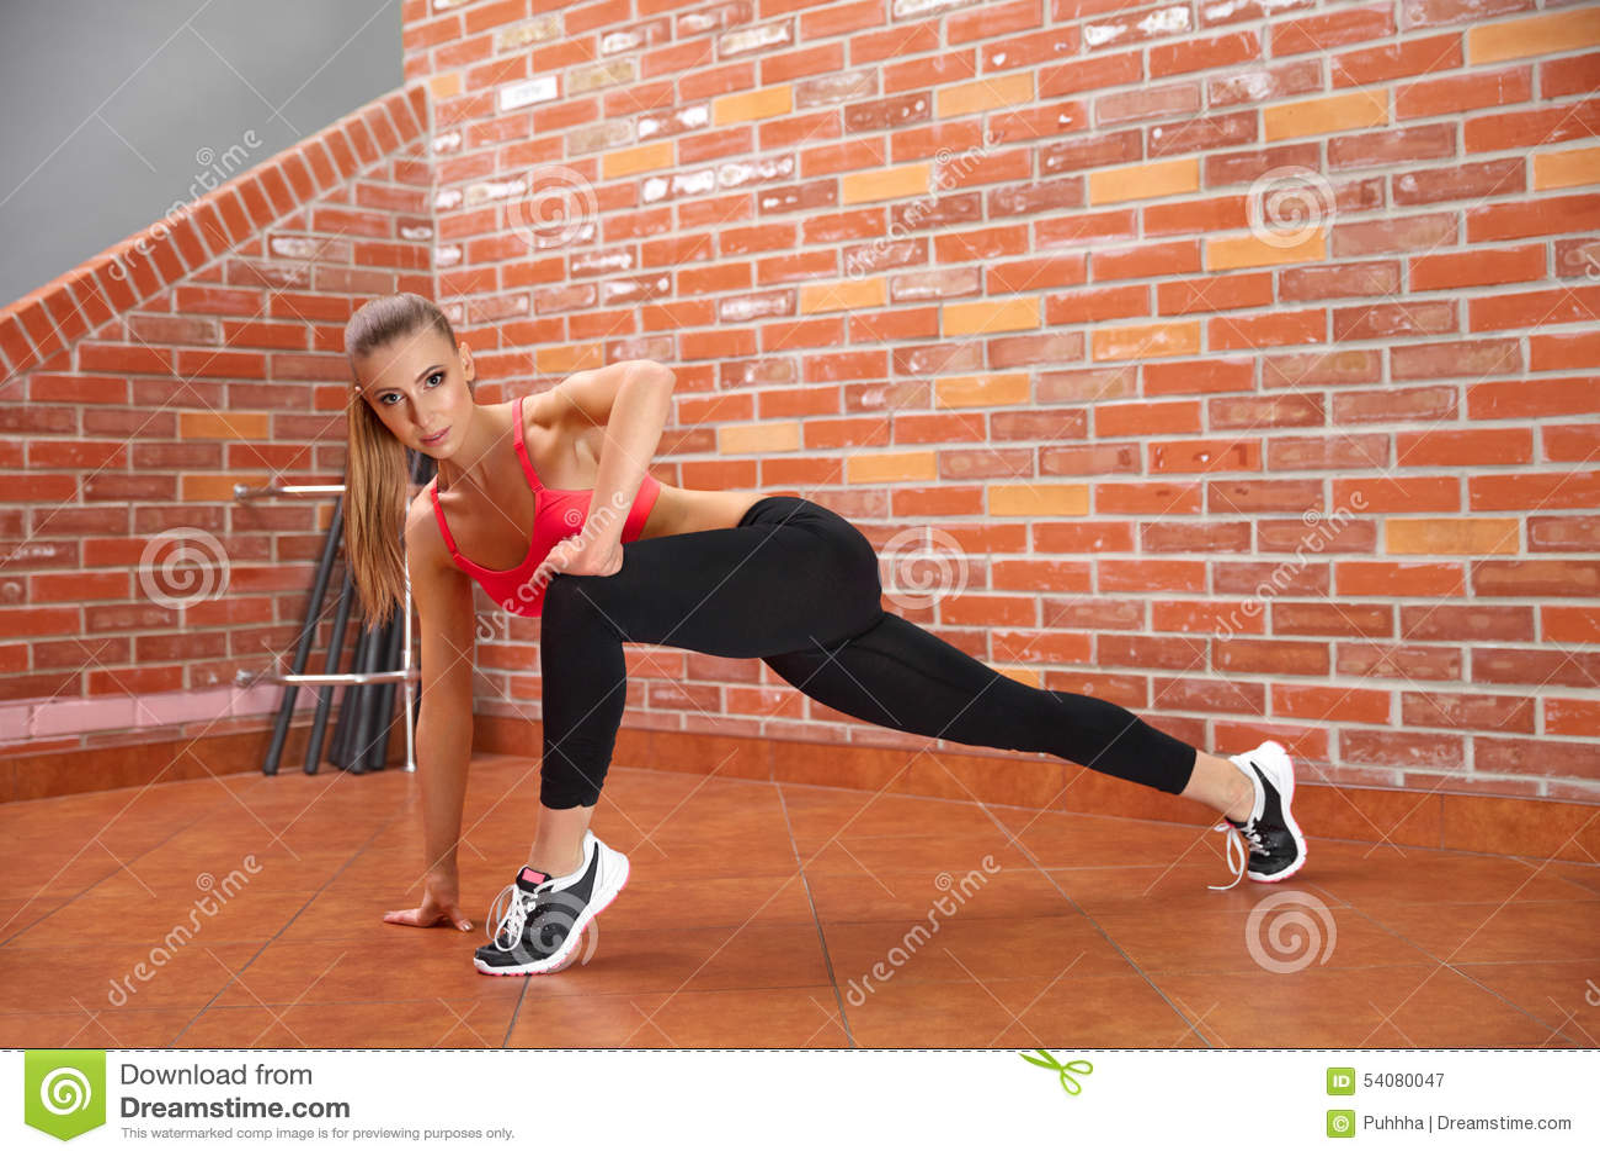 Portret van jong sportief meisje die uitrekkende oefening doen